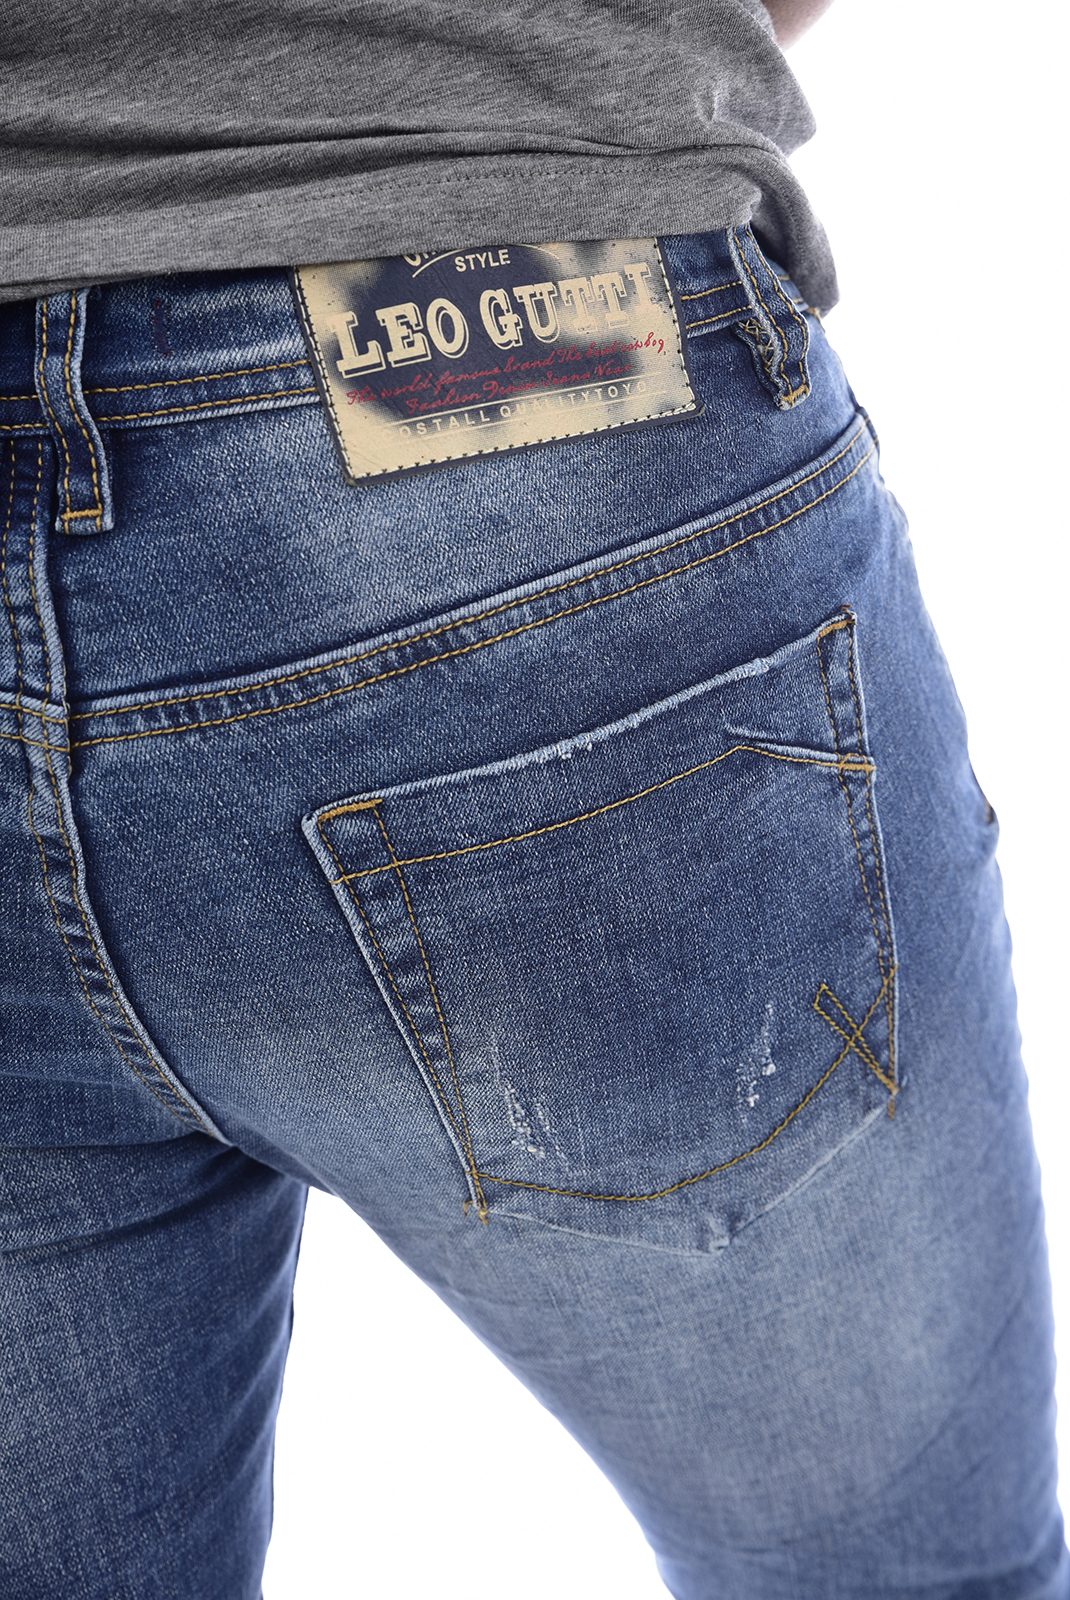 Jeans  Leo gutti 6002 BLEU